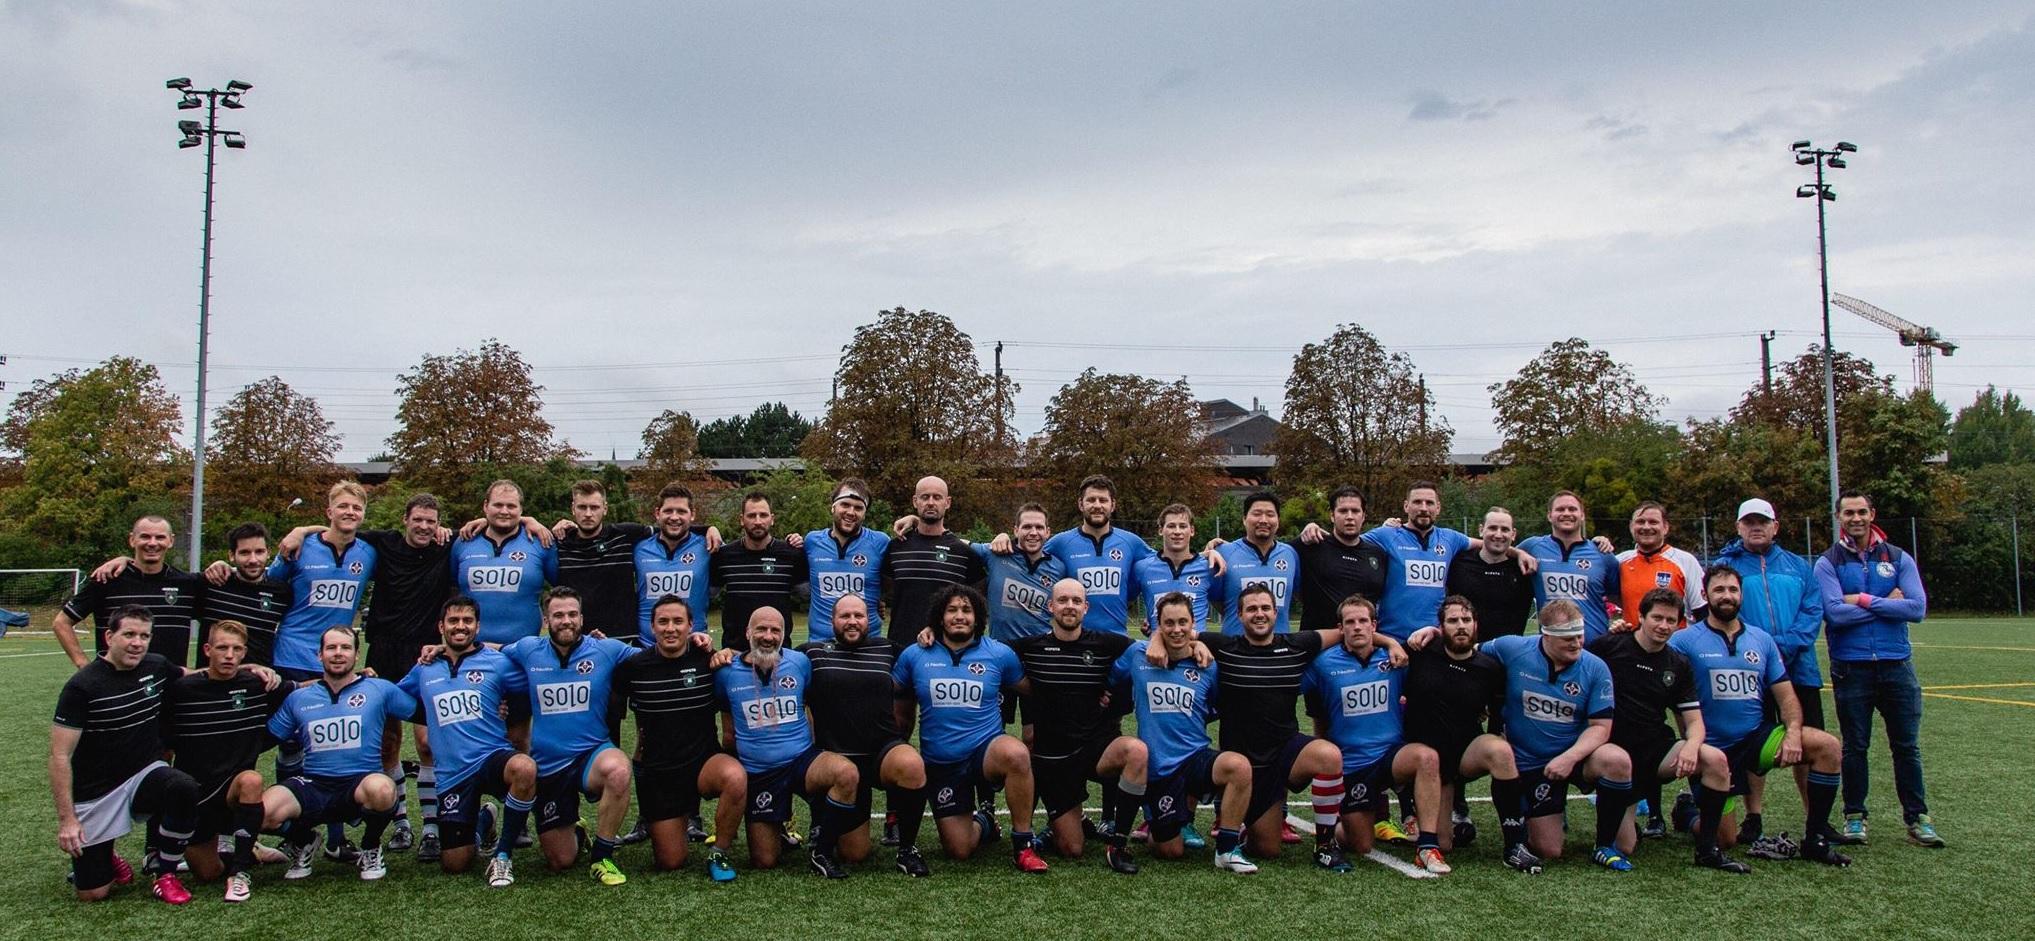 Rugby Klub Bratislava - 2018, Celtic Vienna - Wien